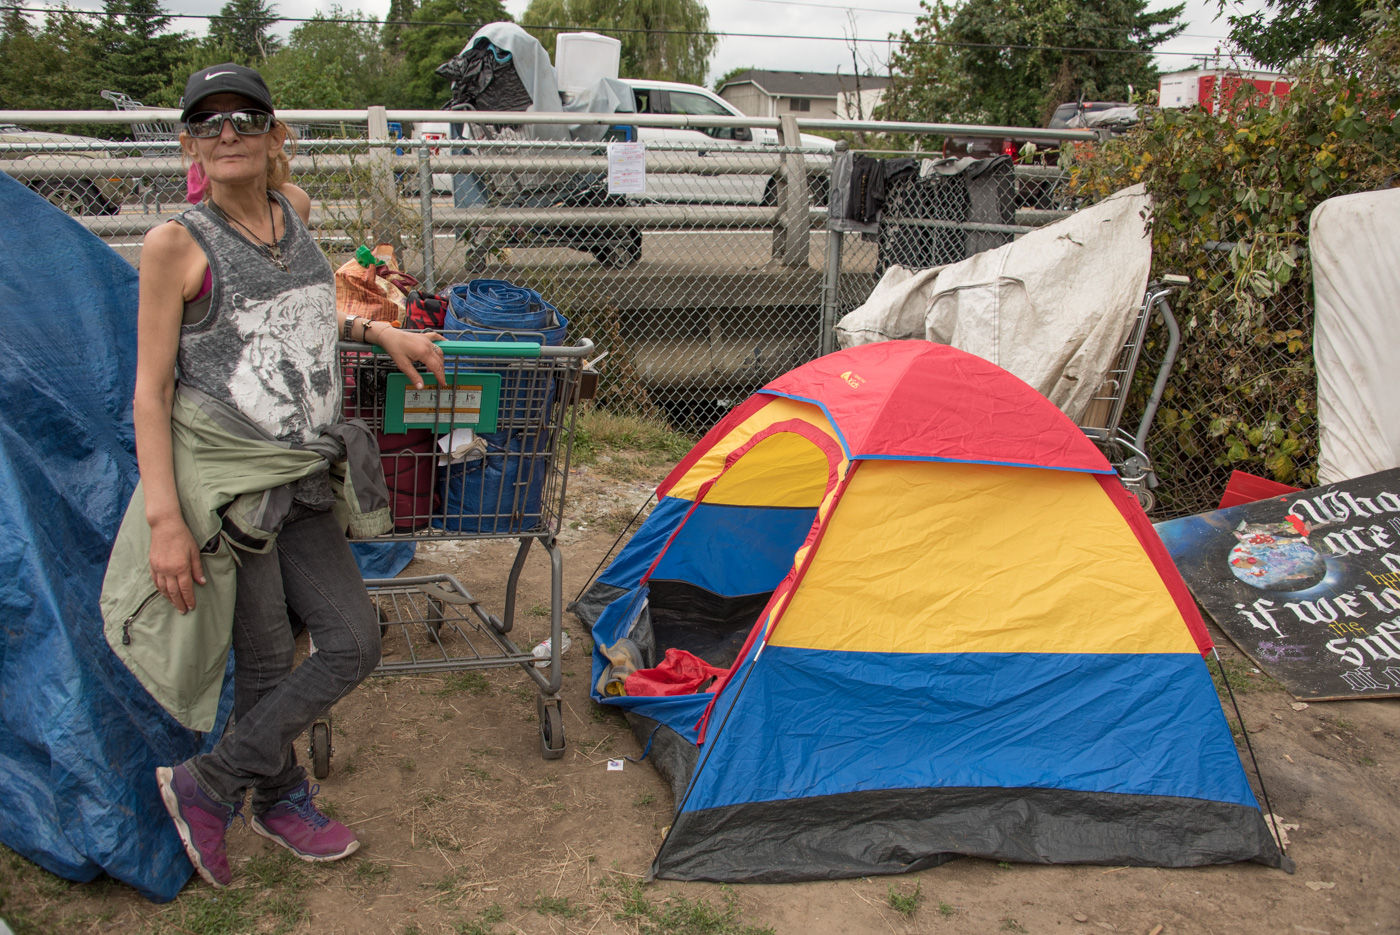 liz obert_usa_urban campers-8.jpg